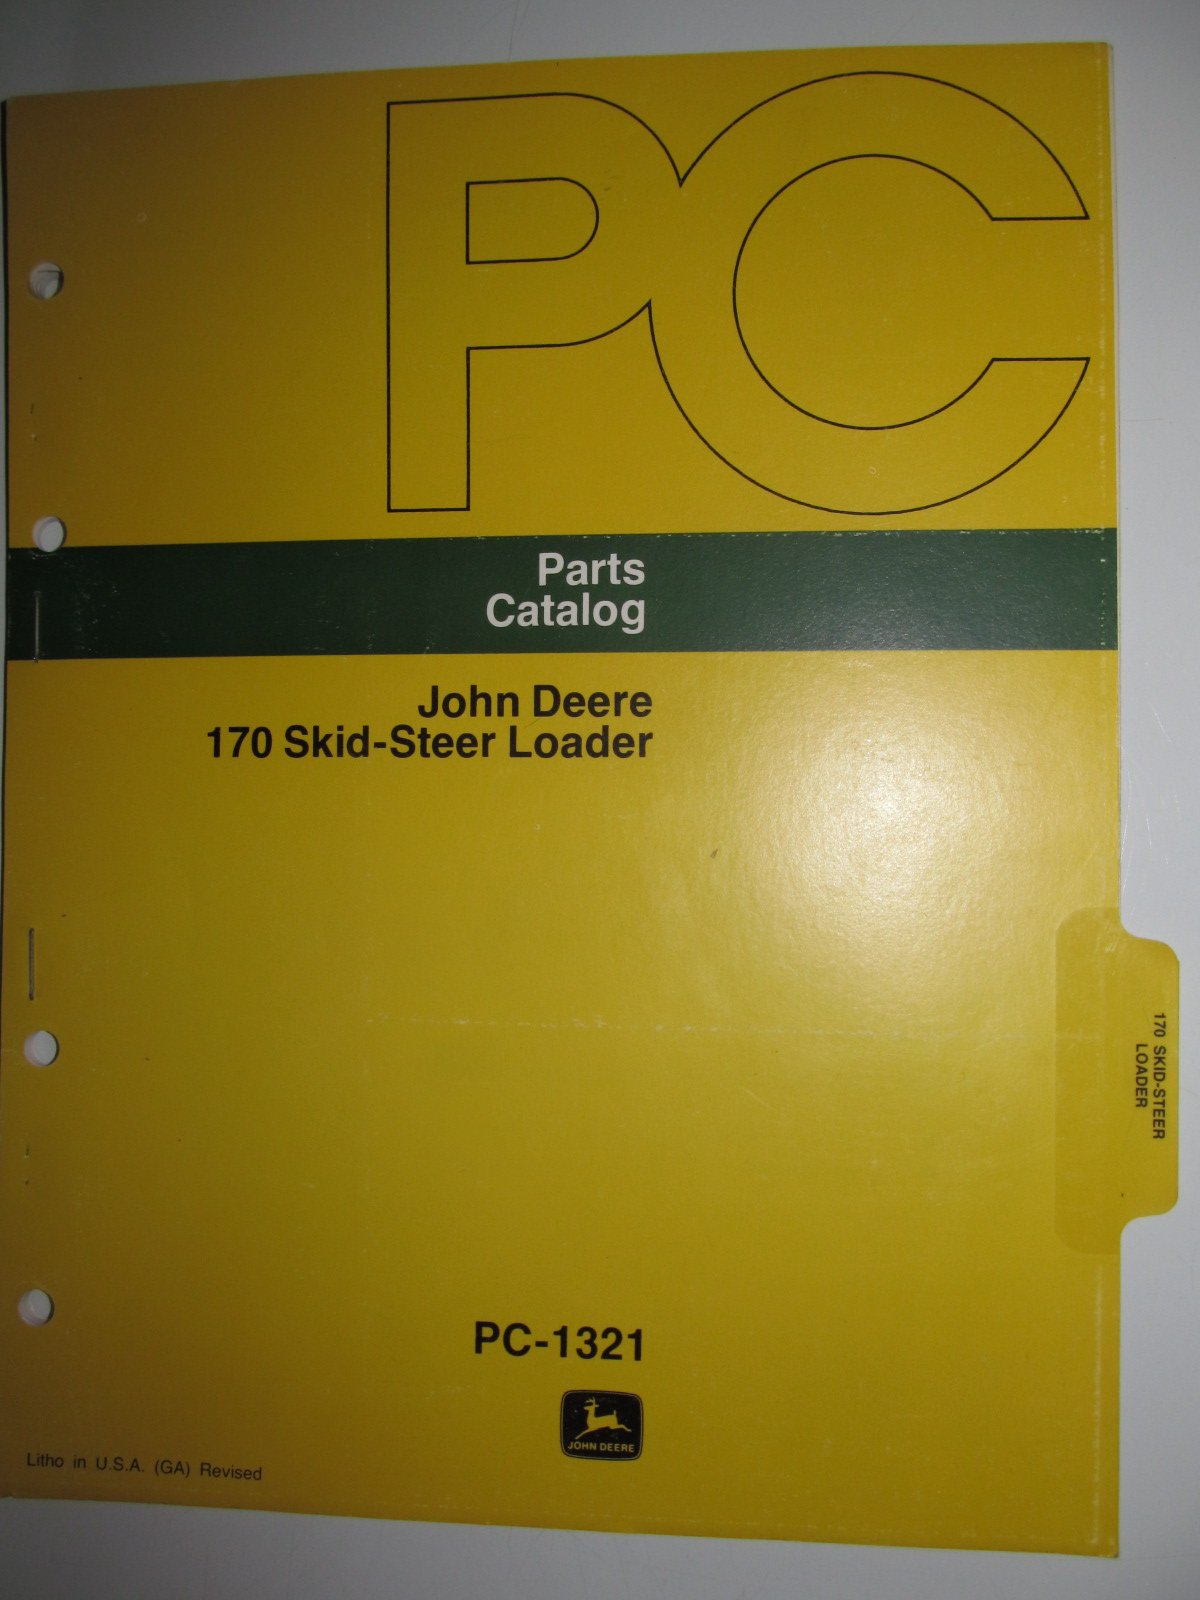 John Deere 46 Farm Loader Parts Catalog Manual ORIGINAL